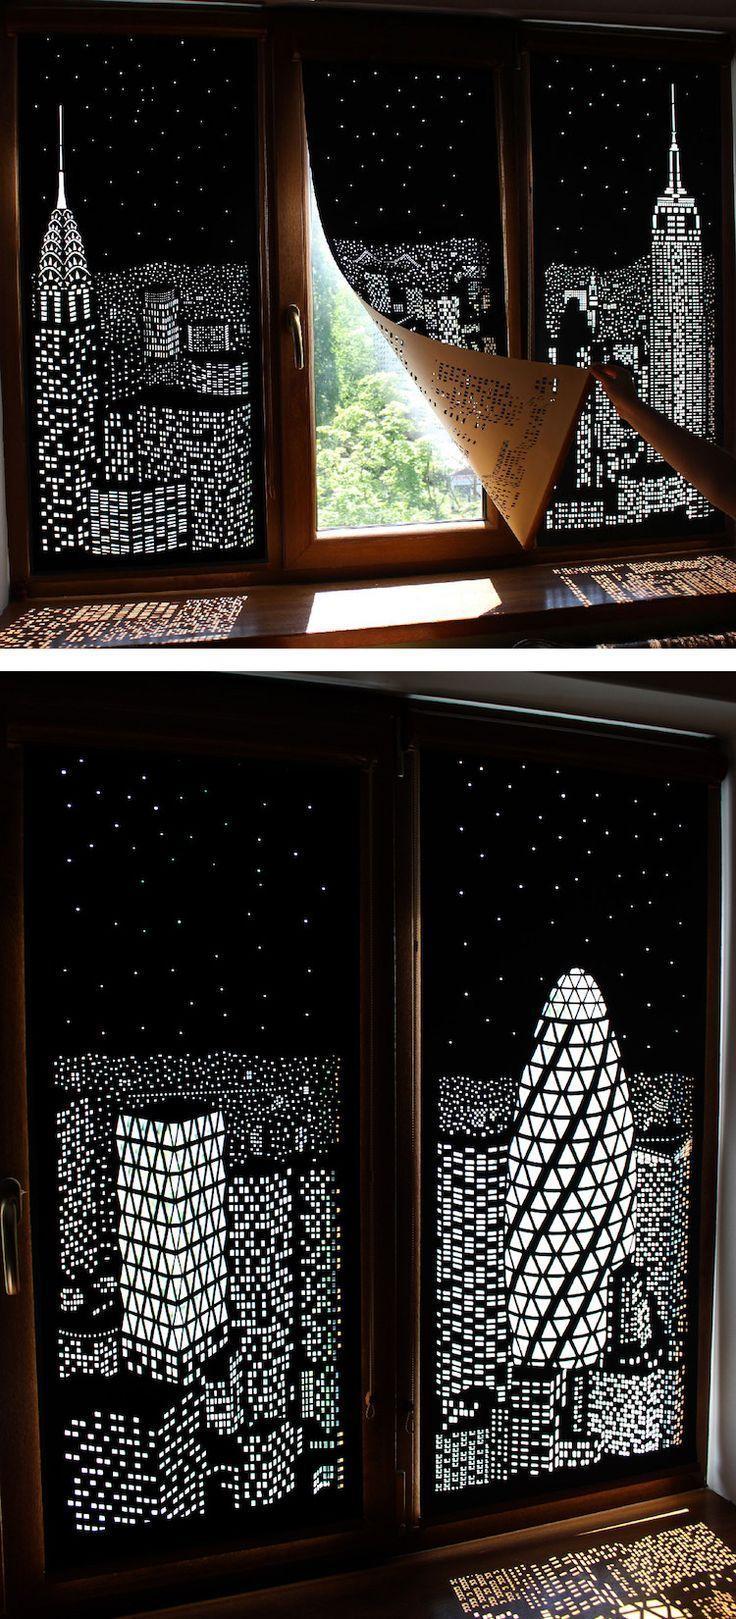 Home decor window  shadow art  window decor  decor ideas  home decor accessories